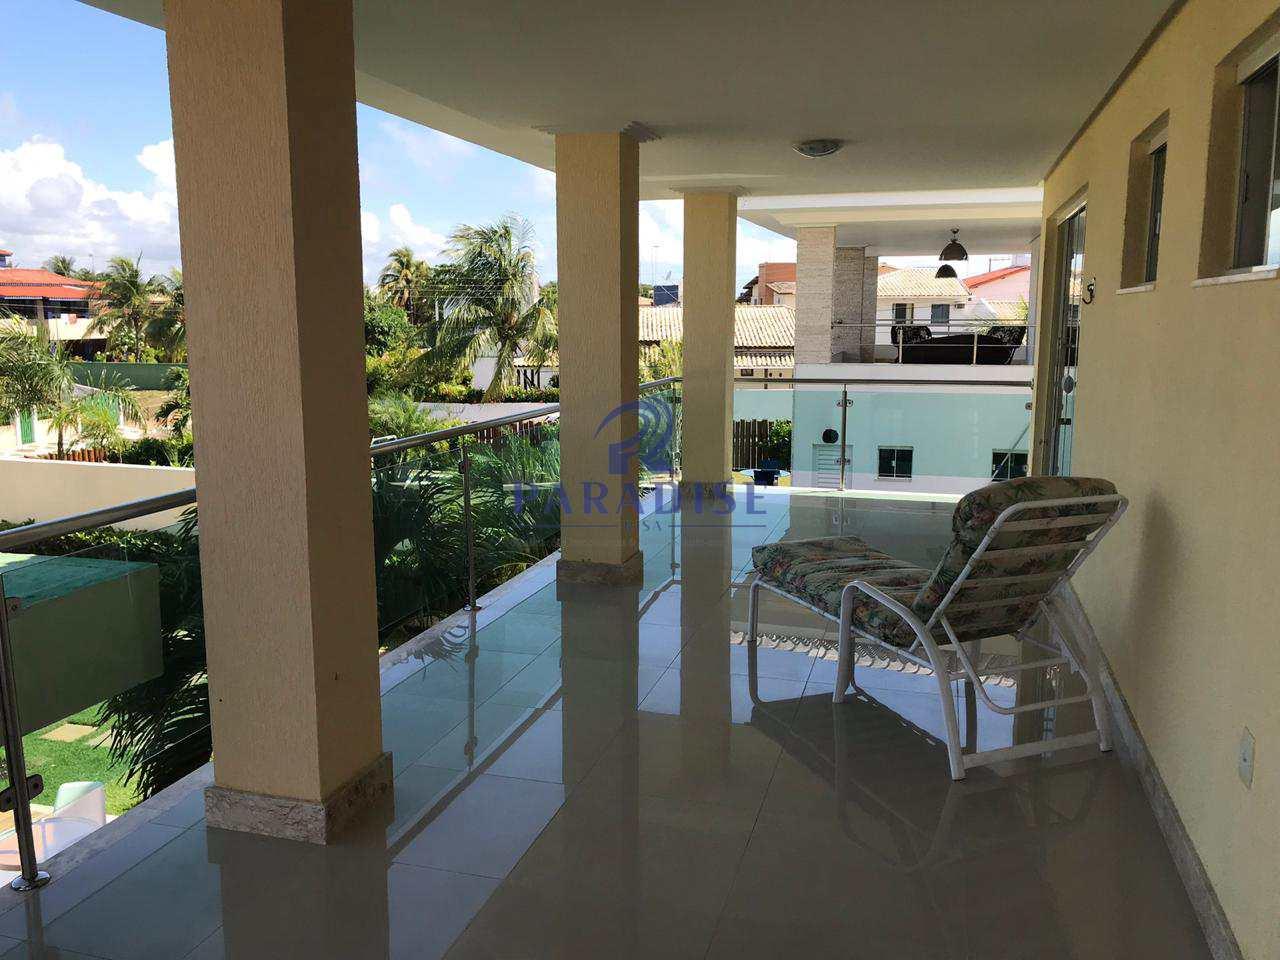 Casa com 4 dorms, Guarajuba (Monte Gordo), Camaçari - R$ 1.5 mi, Cod: 56400